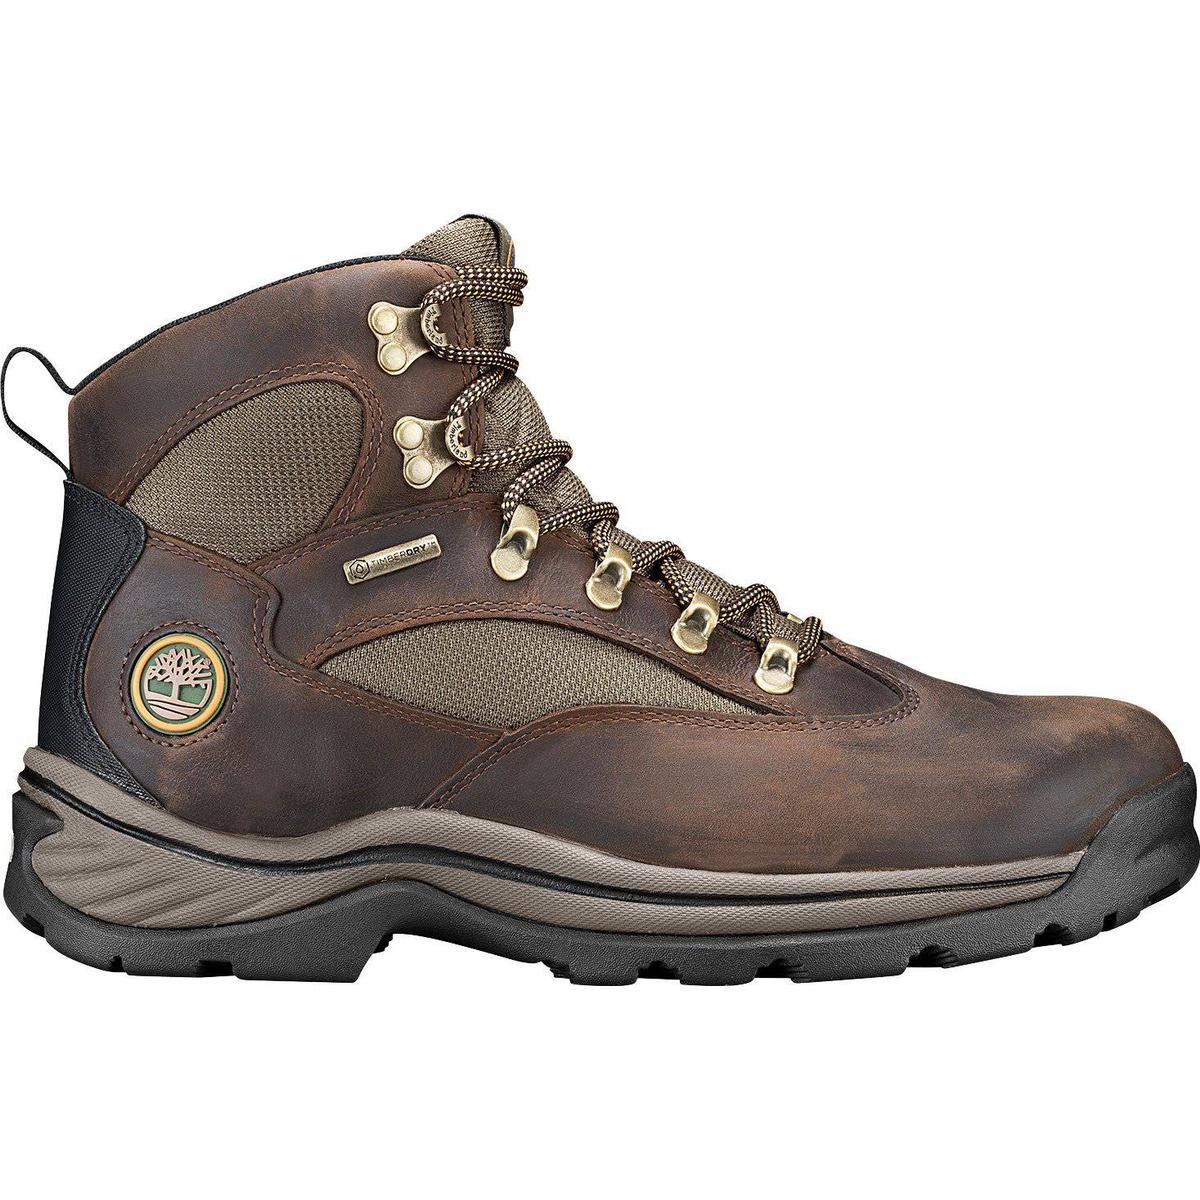 New Mens Timberland Tan Killington 6` Nubuck Boots Lace Up